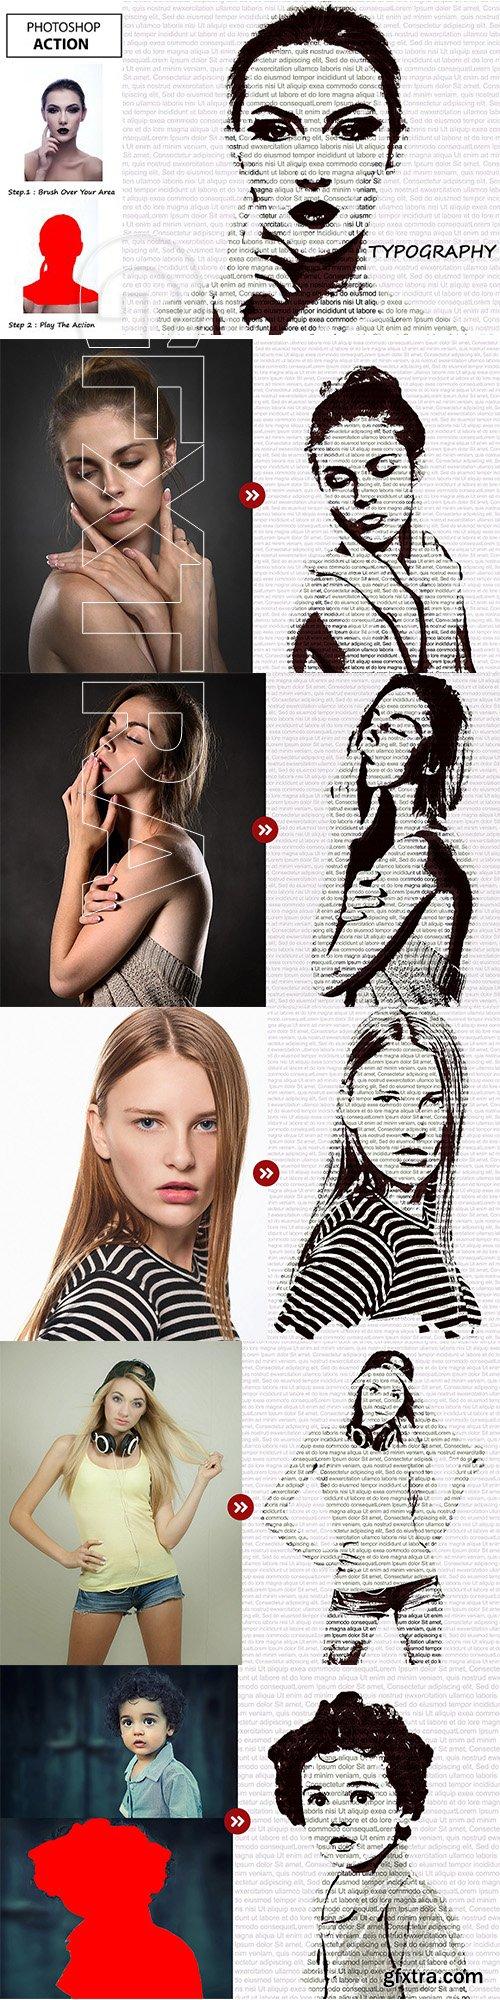 CreativeMarket - Typography Photoshop Action 3149351